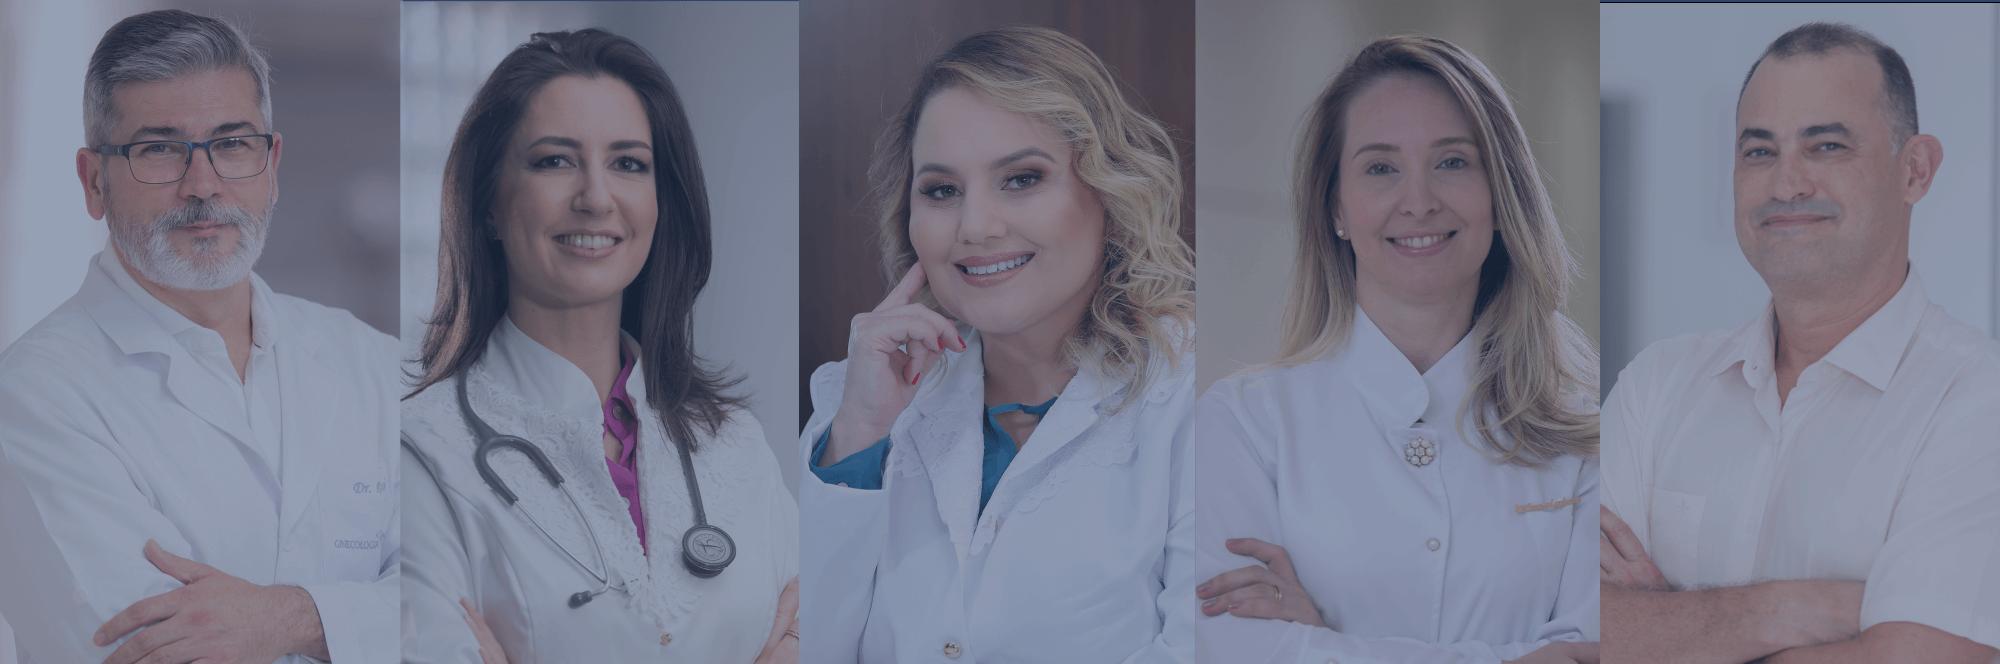 case marketing medico - Grupo Genesis obstetricia - Yannis Marketing